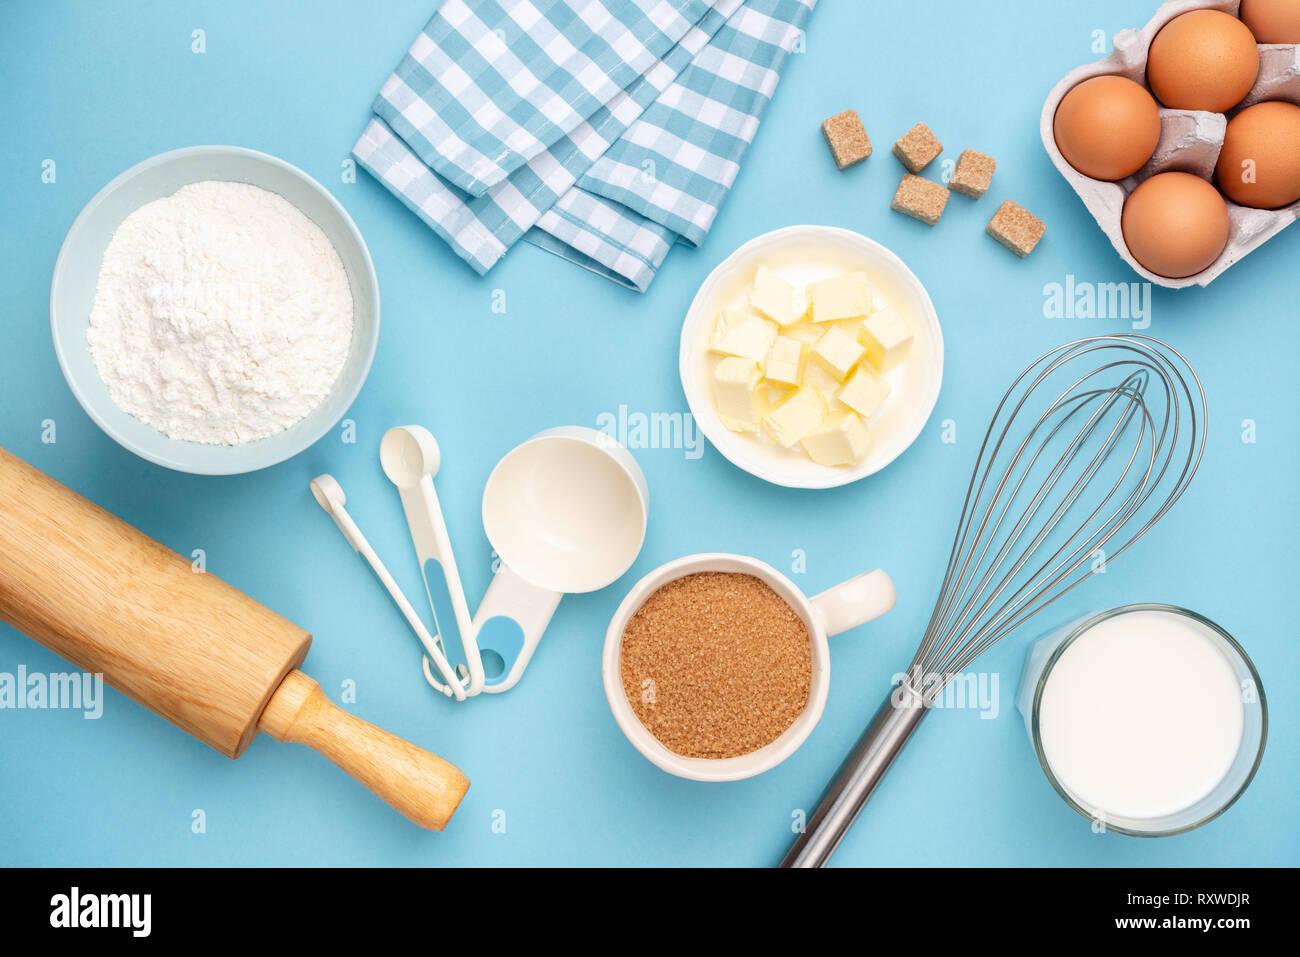 Kitchen Utensils And Baking Ingredients On Blue Background